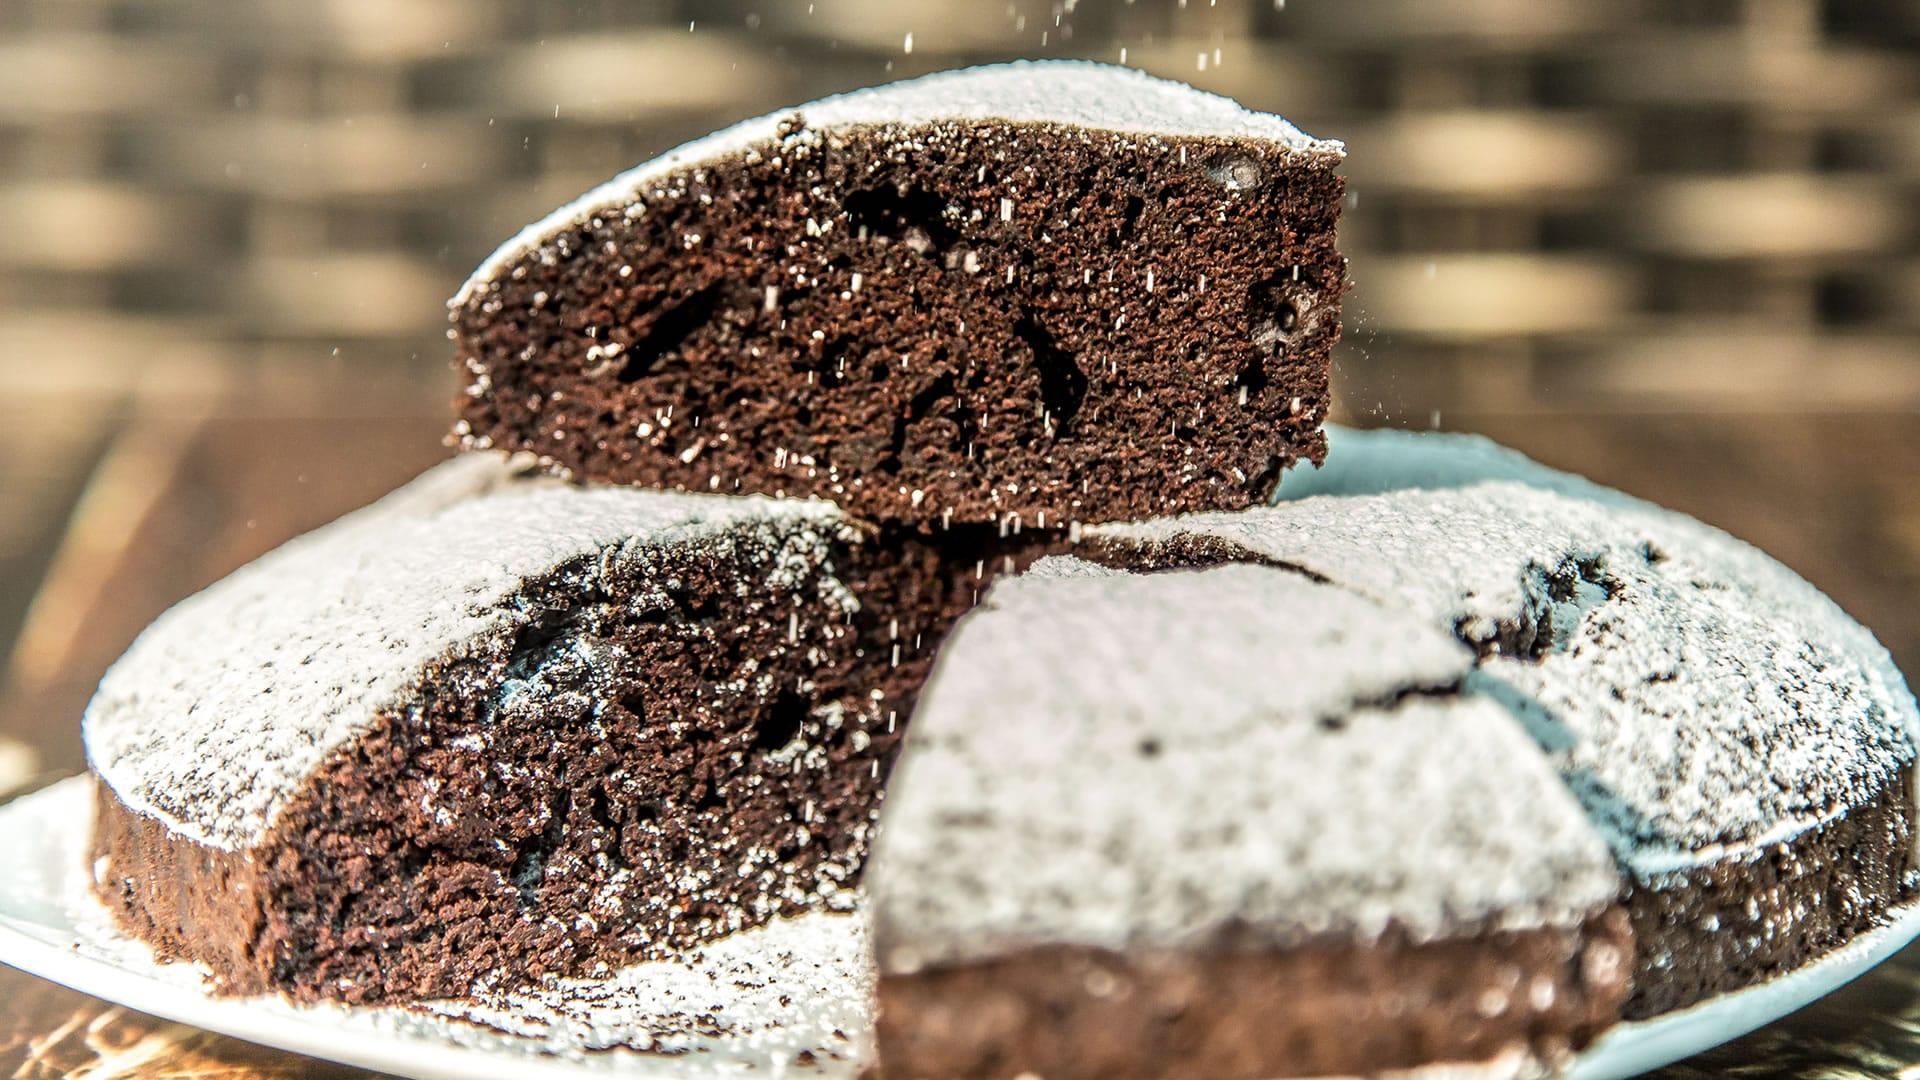 Dolci Senza Lievito E Burro.Torta Matta Crazy Cake Senza Uova Burro Latte Lievito